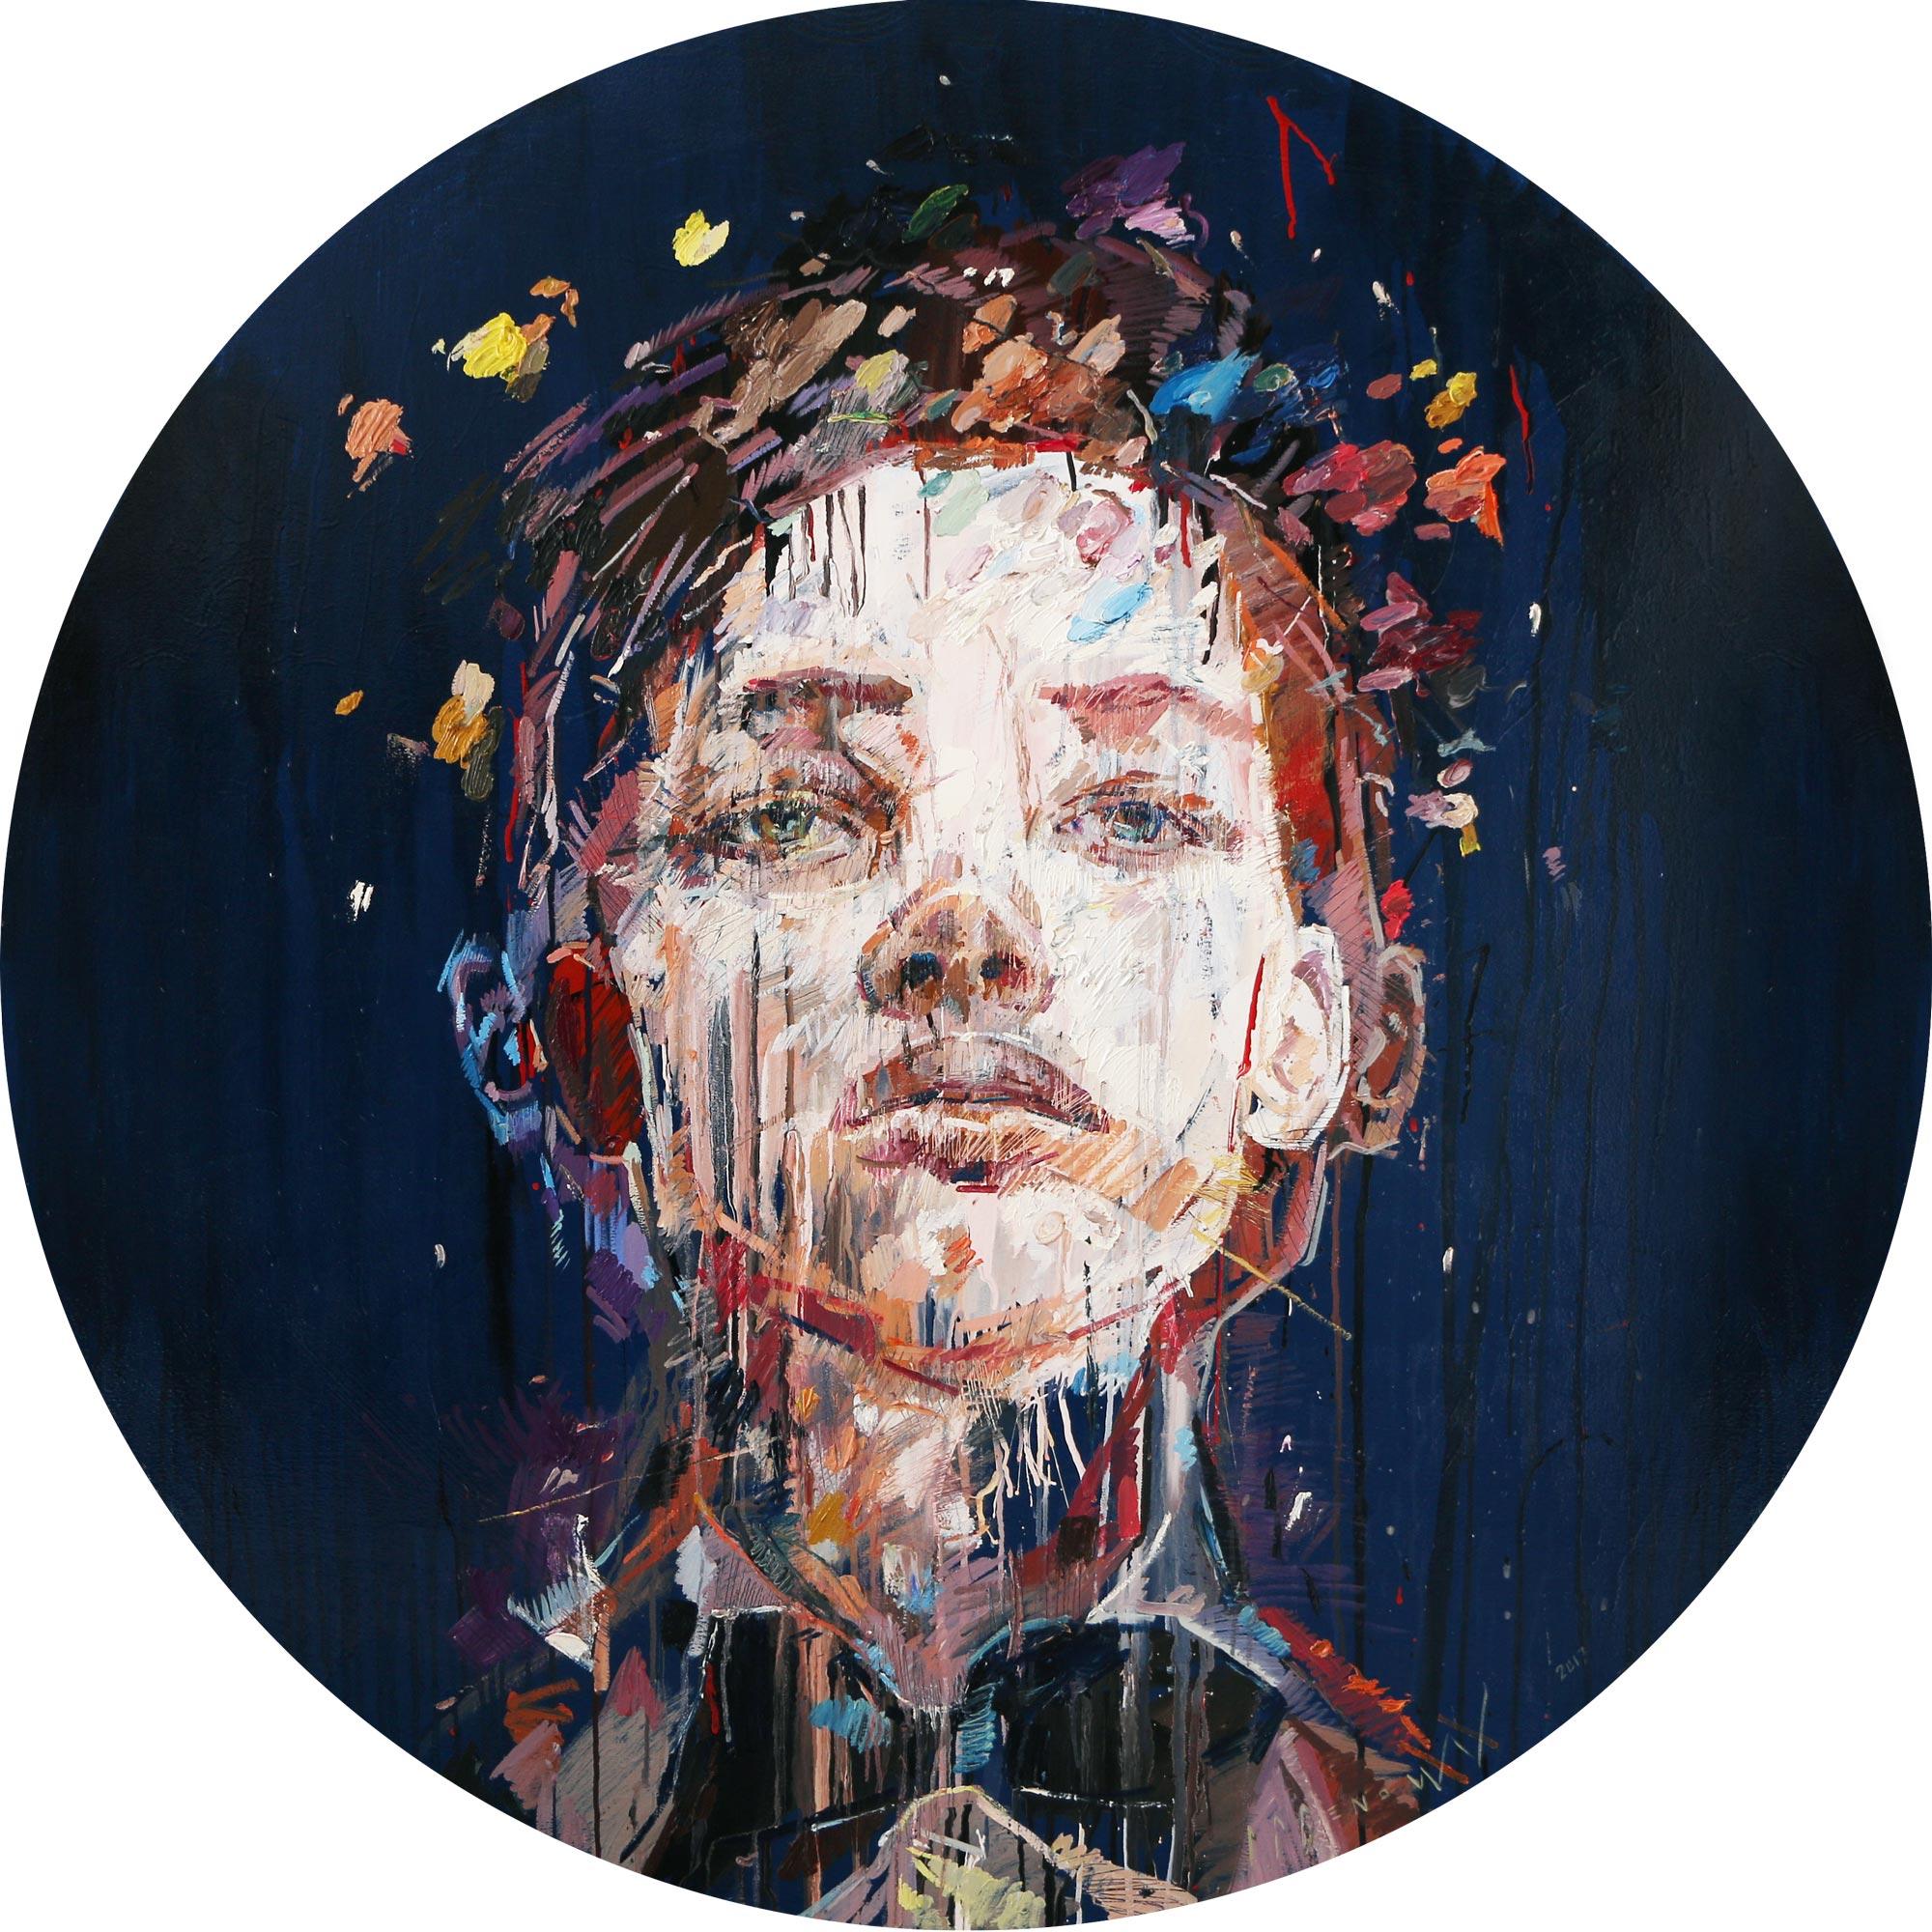 Embellish (Nikephoros Rossi) . Oil on canvas. 130cm diameter.